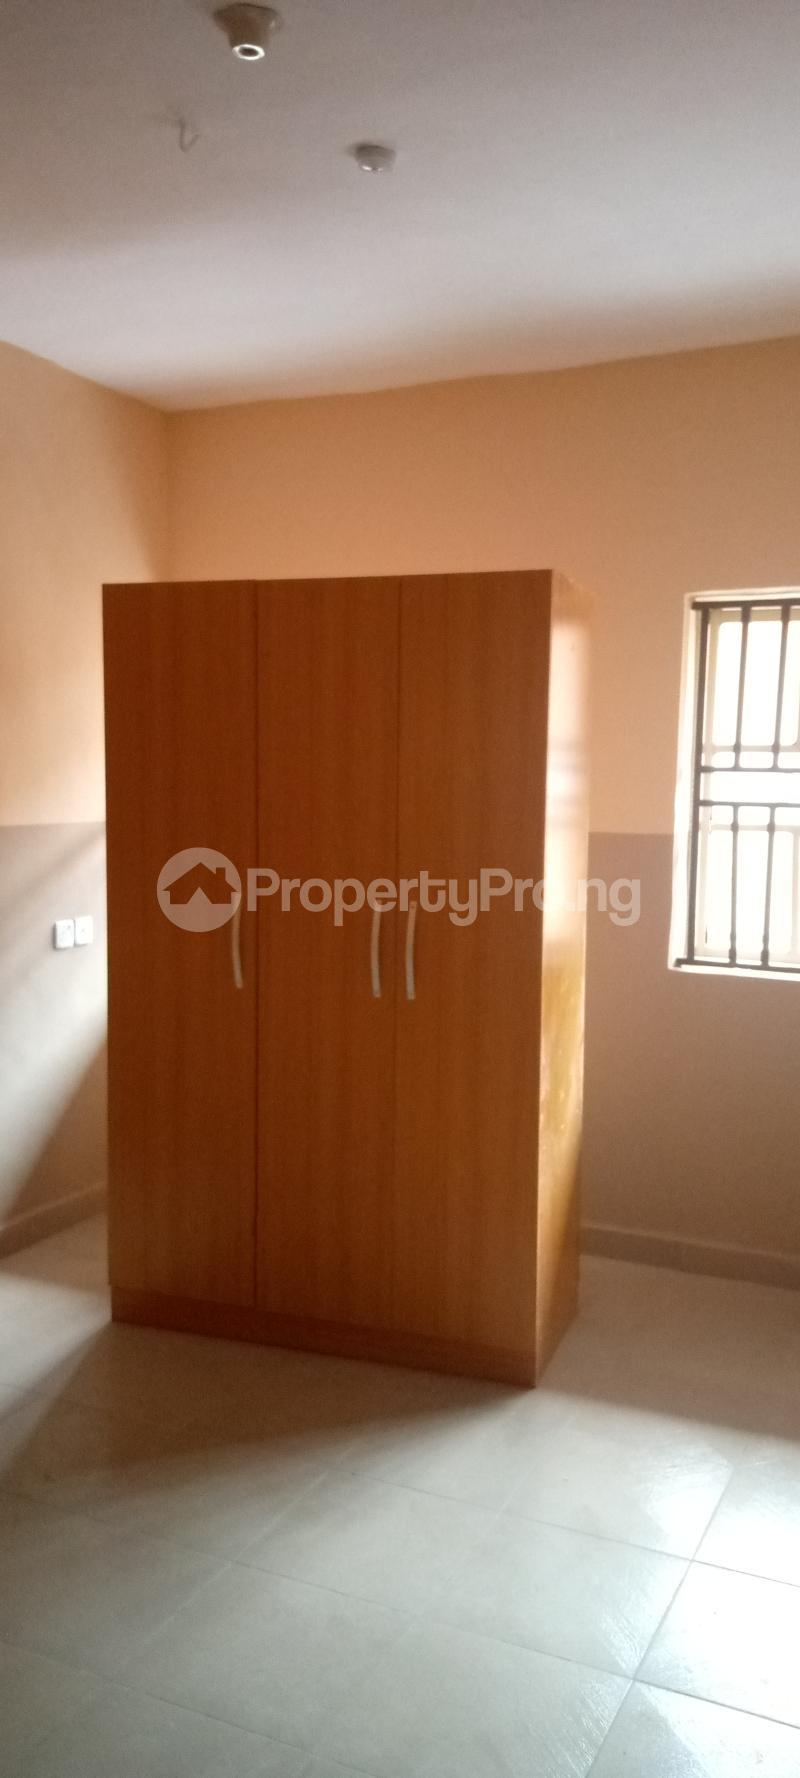 3 bedroom Blocks of Flats House for rent Basin area Ilorin Kwara - 3